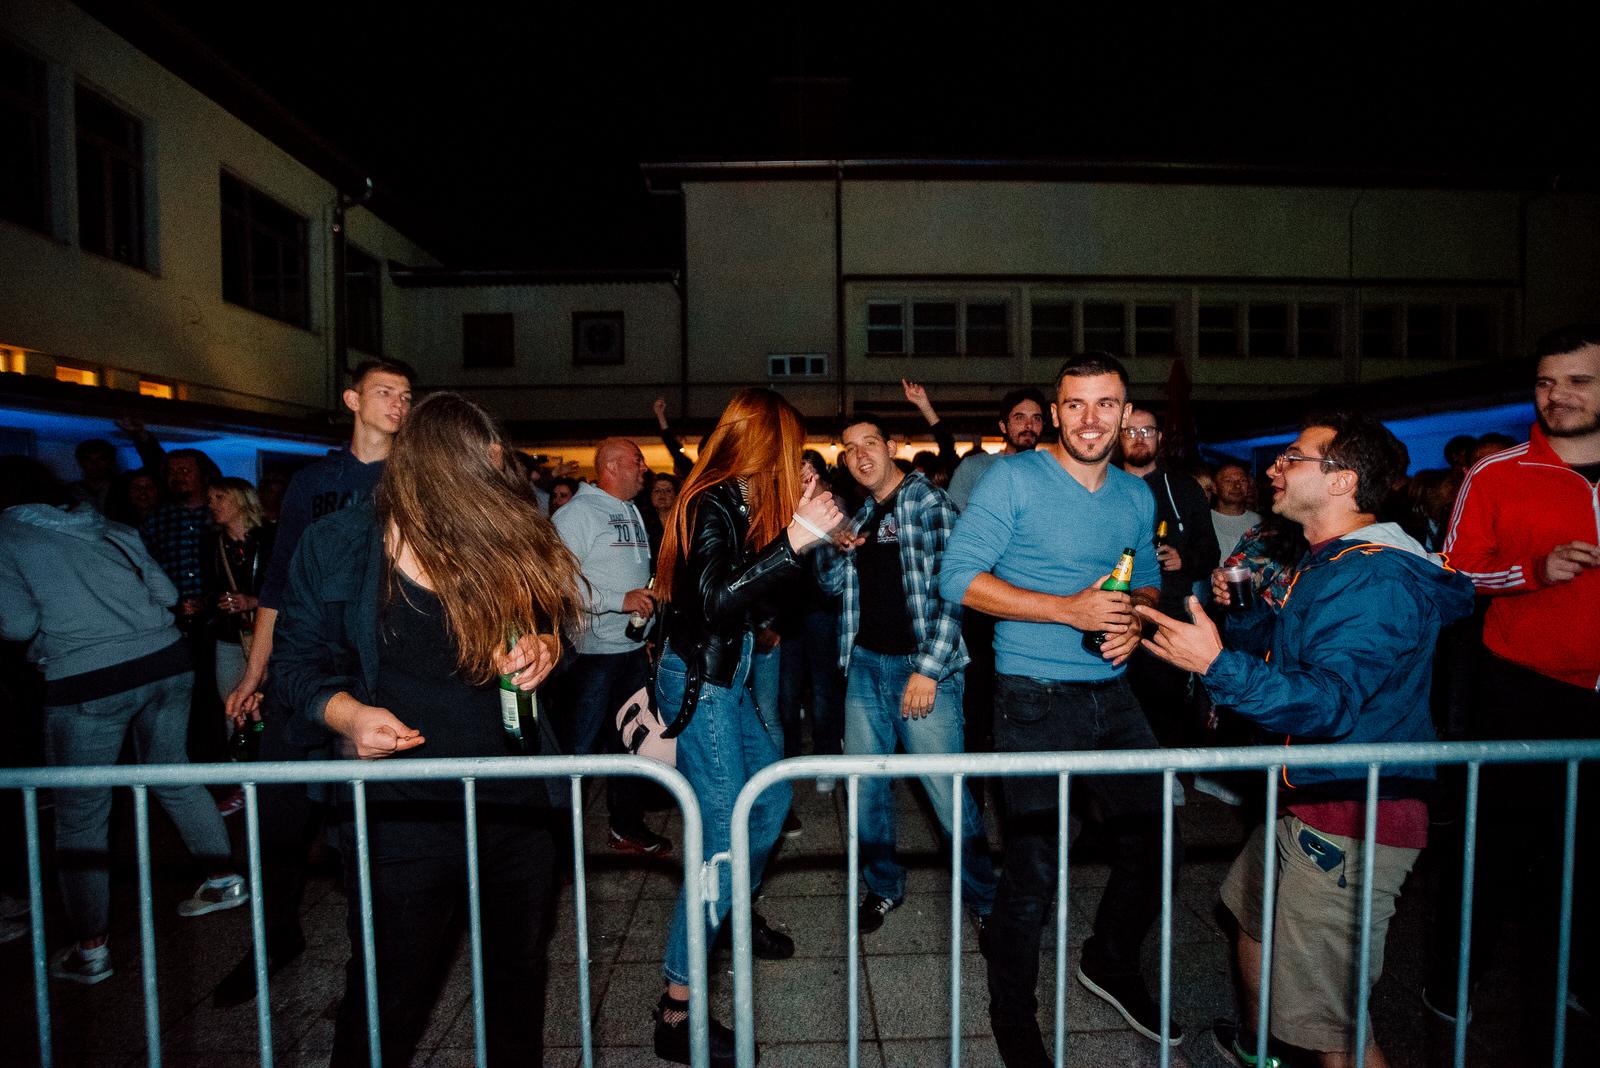 likaclub_grocks-2019_tbf-barbara-munjas-27